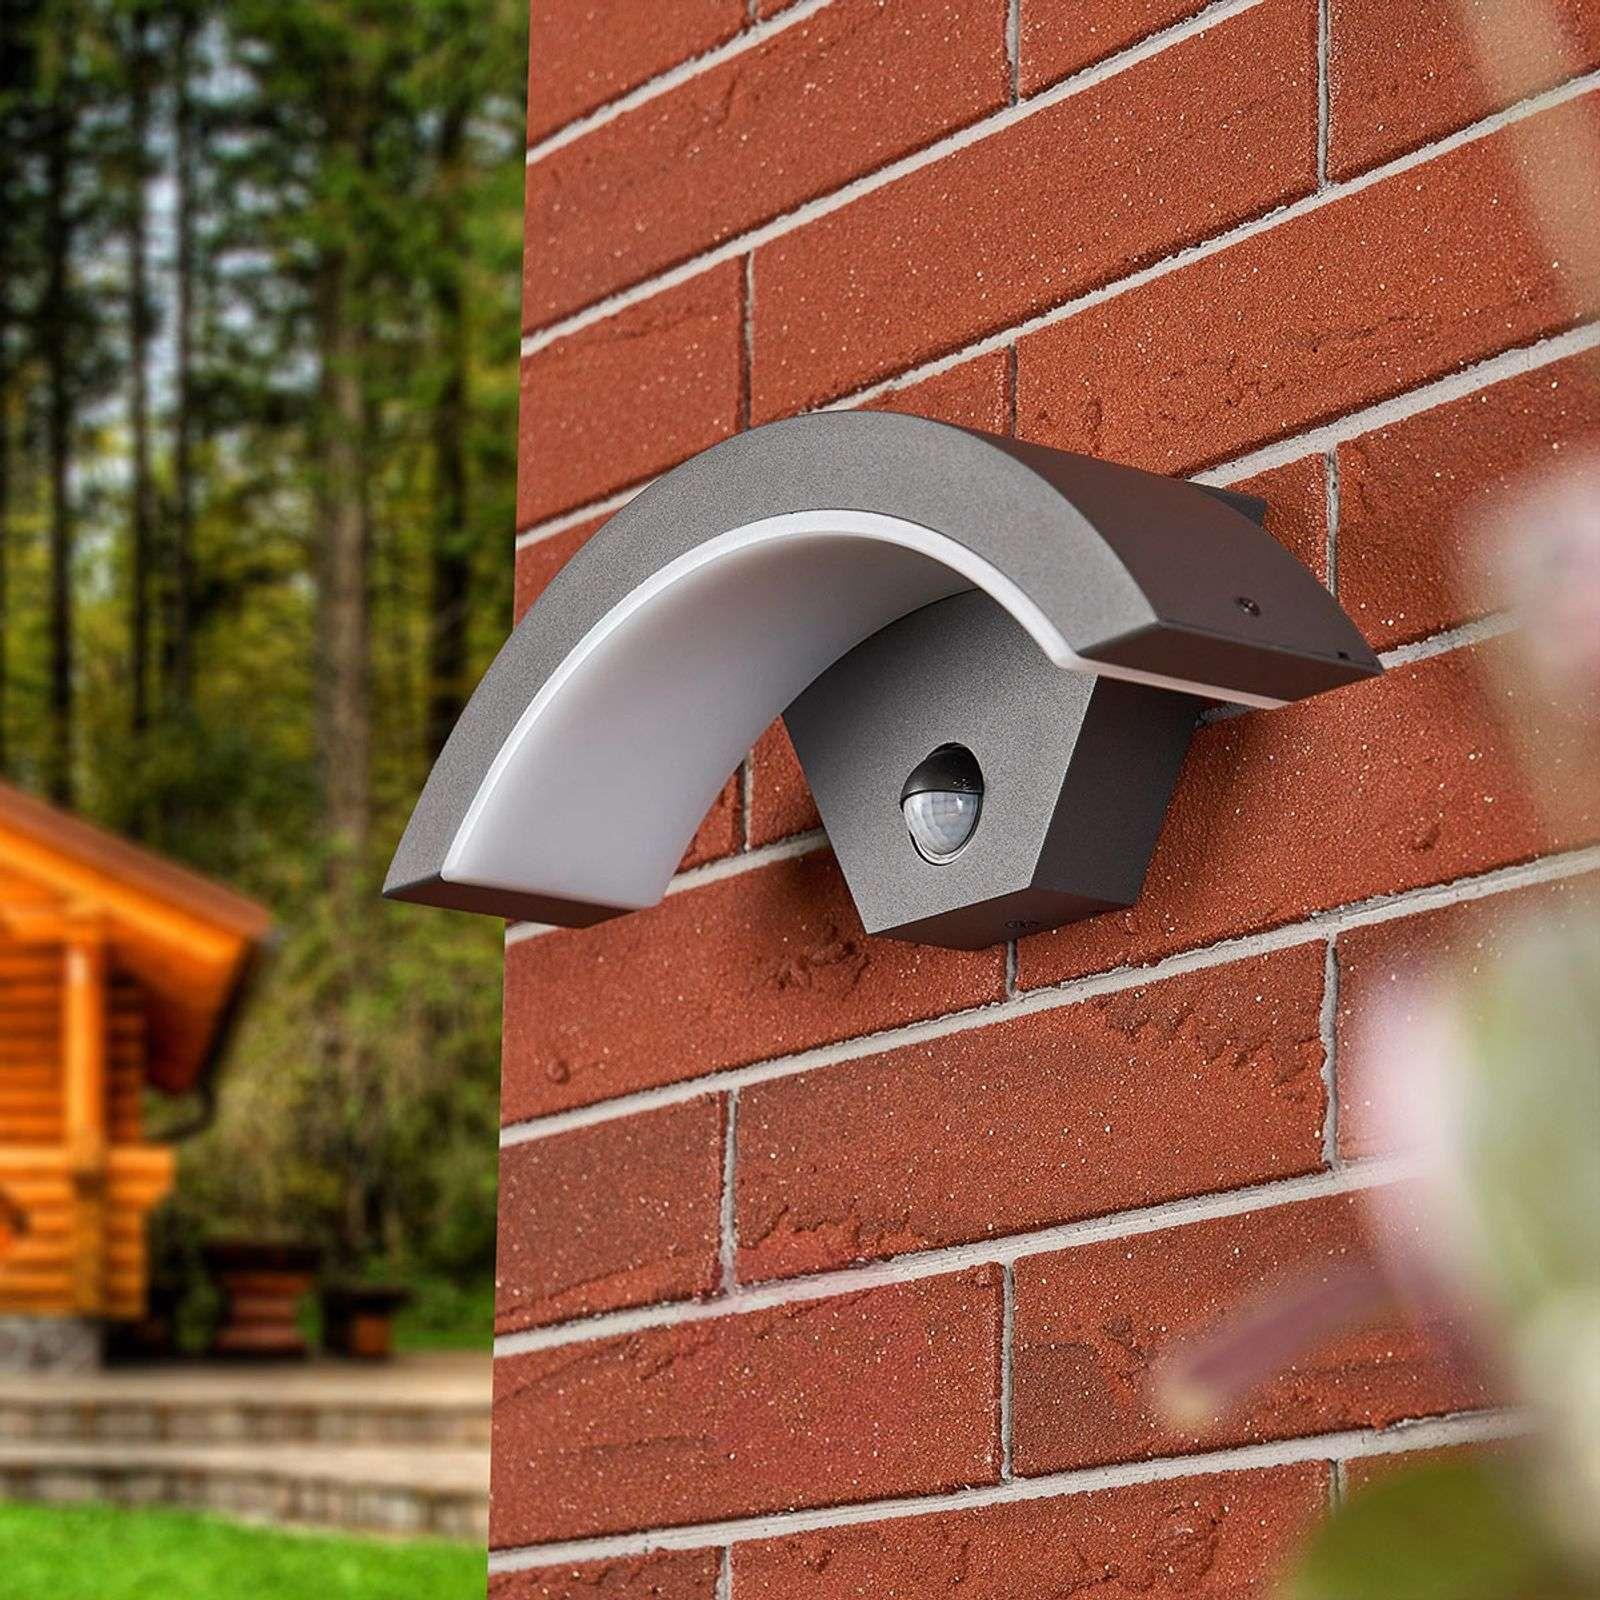 Sensor LED outdoor wall lamp Jule-8032090-010